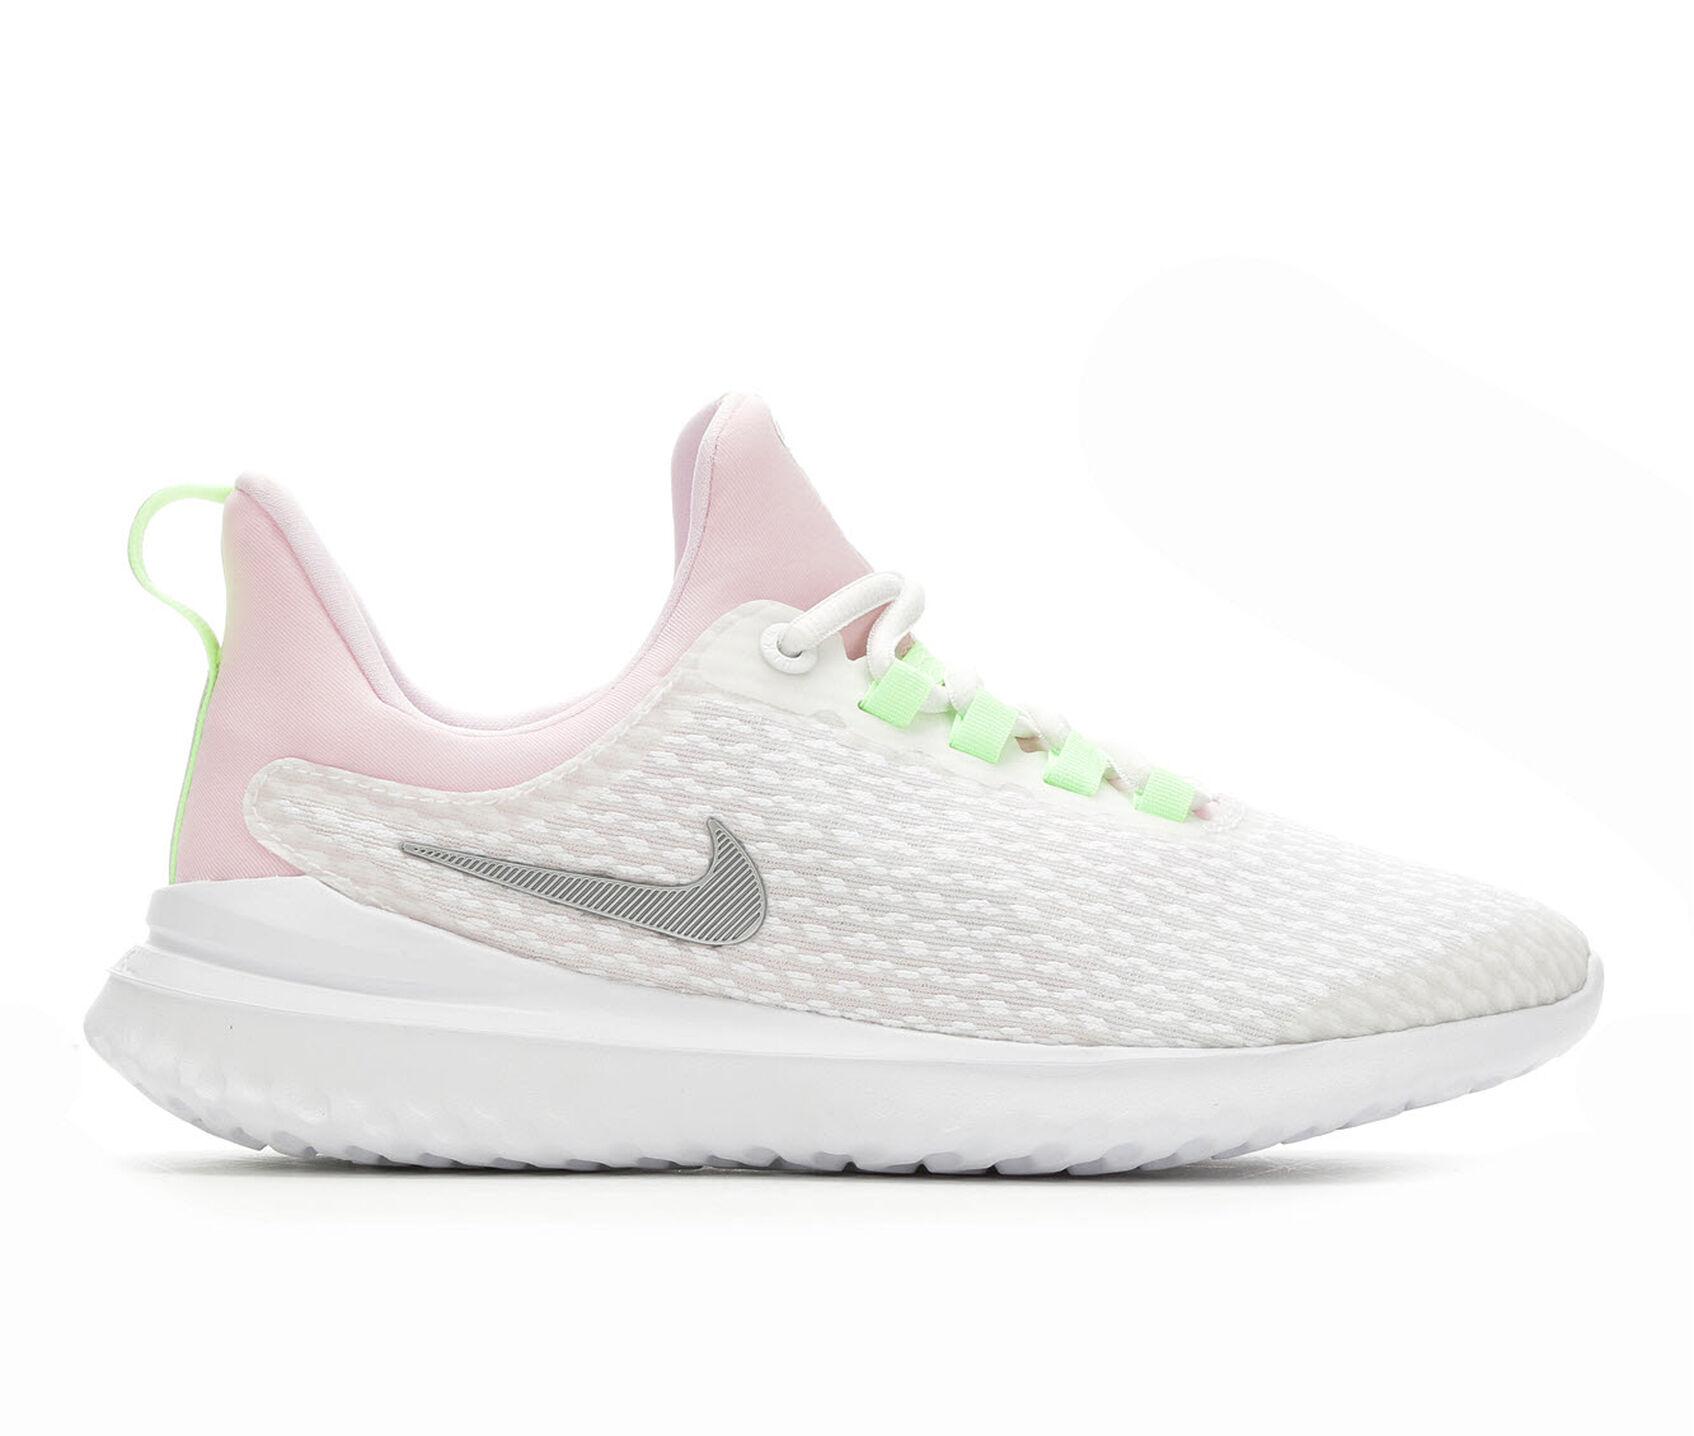 new style 77cf0 01cd6 Girls' Nike Big Kid Renew Rival Running Shoes